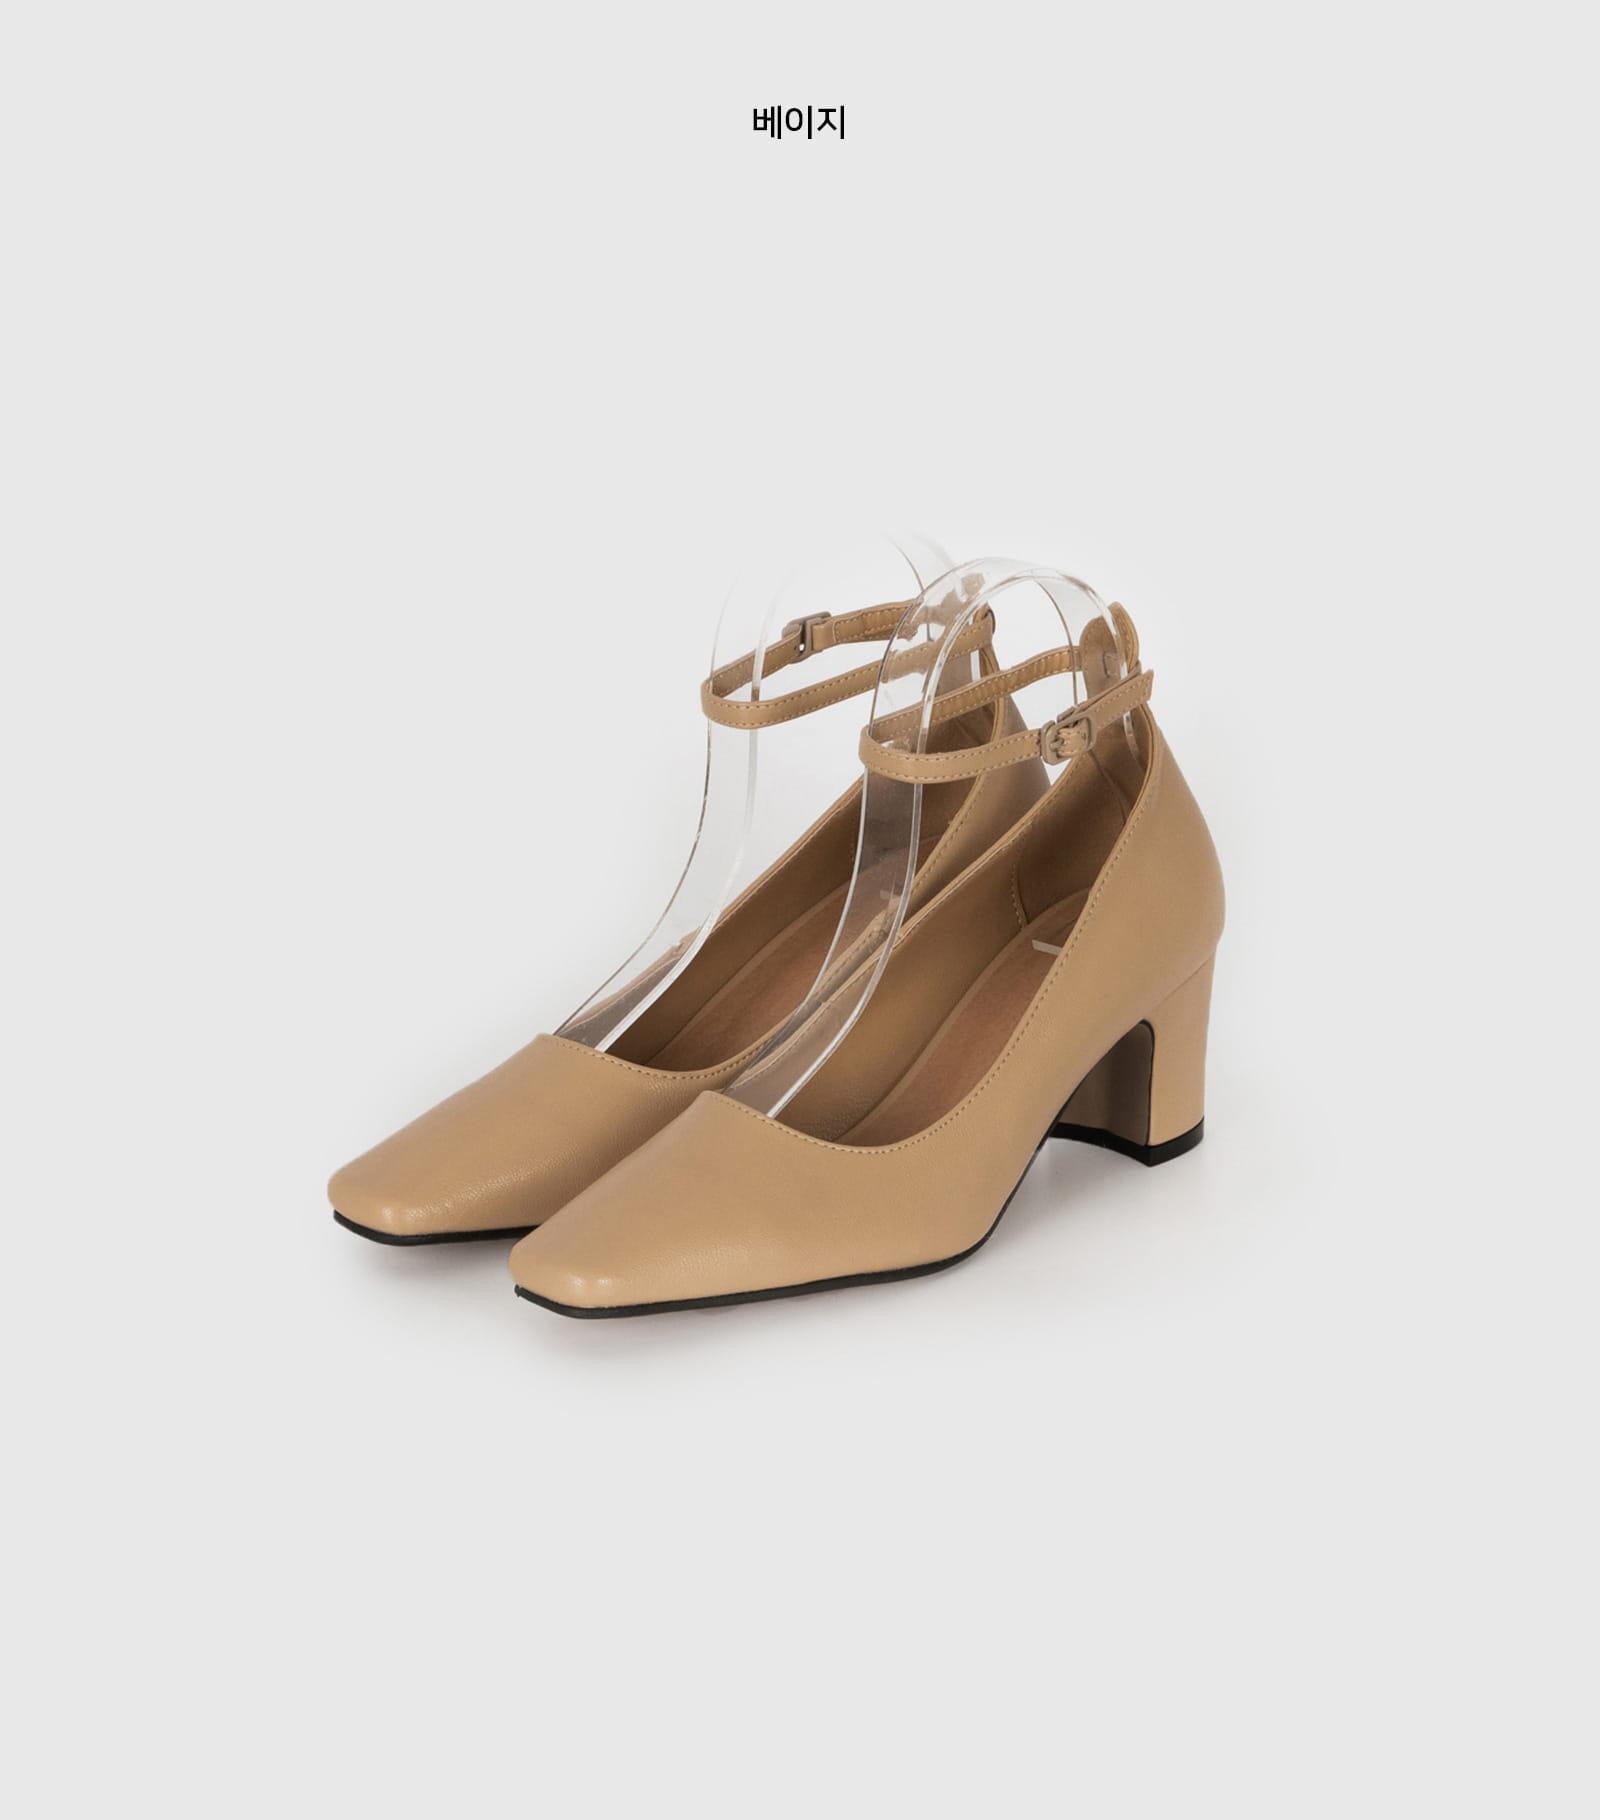 Dane Mary Jane high heel pumps